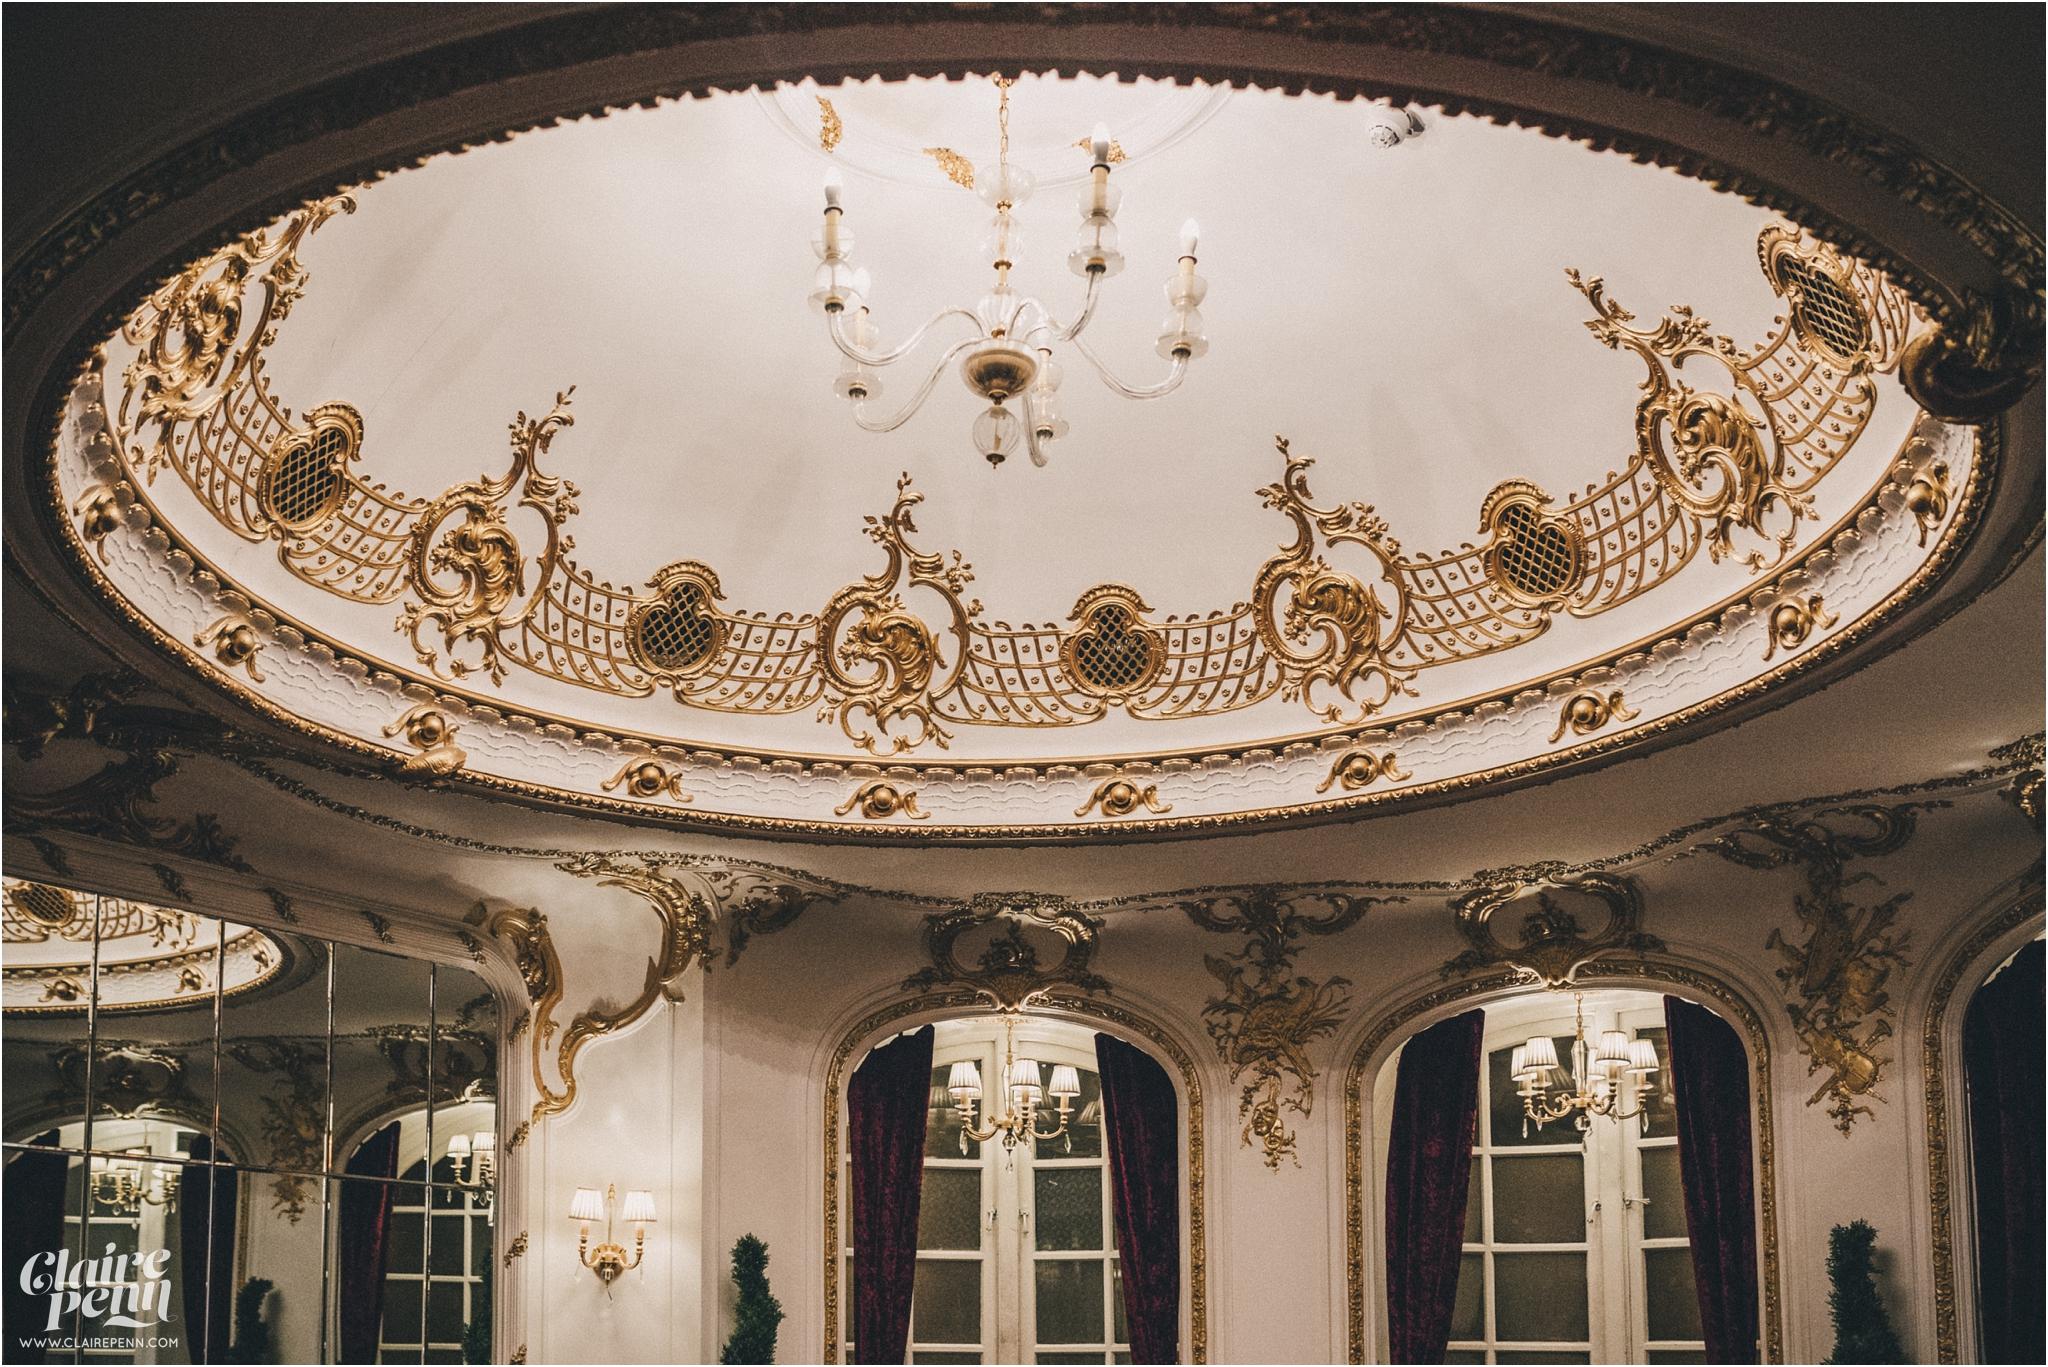 Paradise by way of Kensall Green London pub intimate wedding_0005.jpg